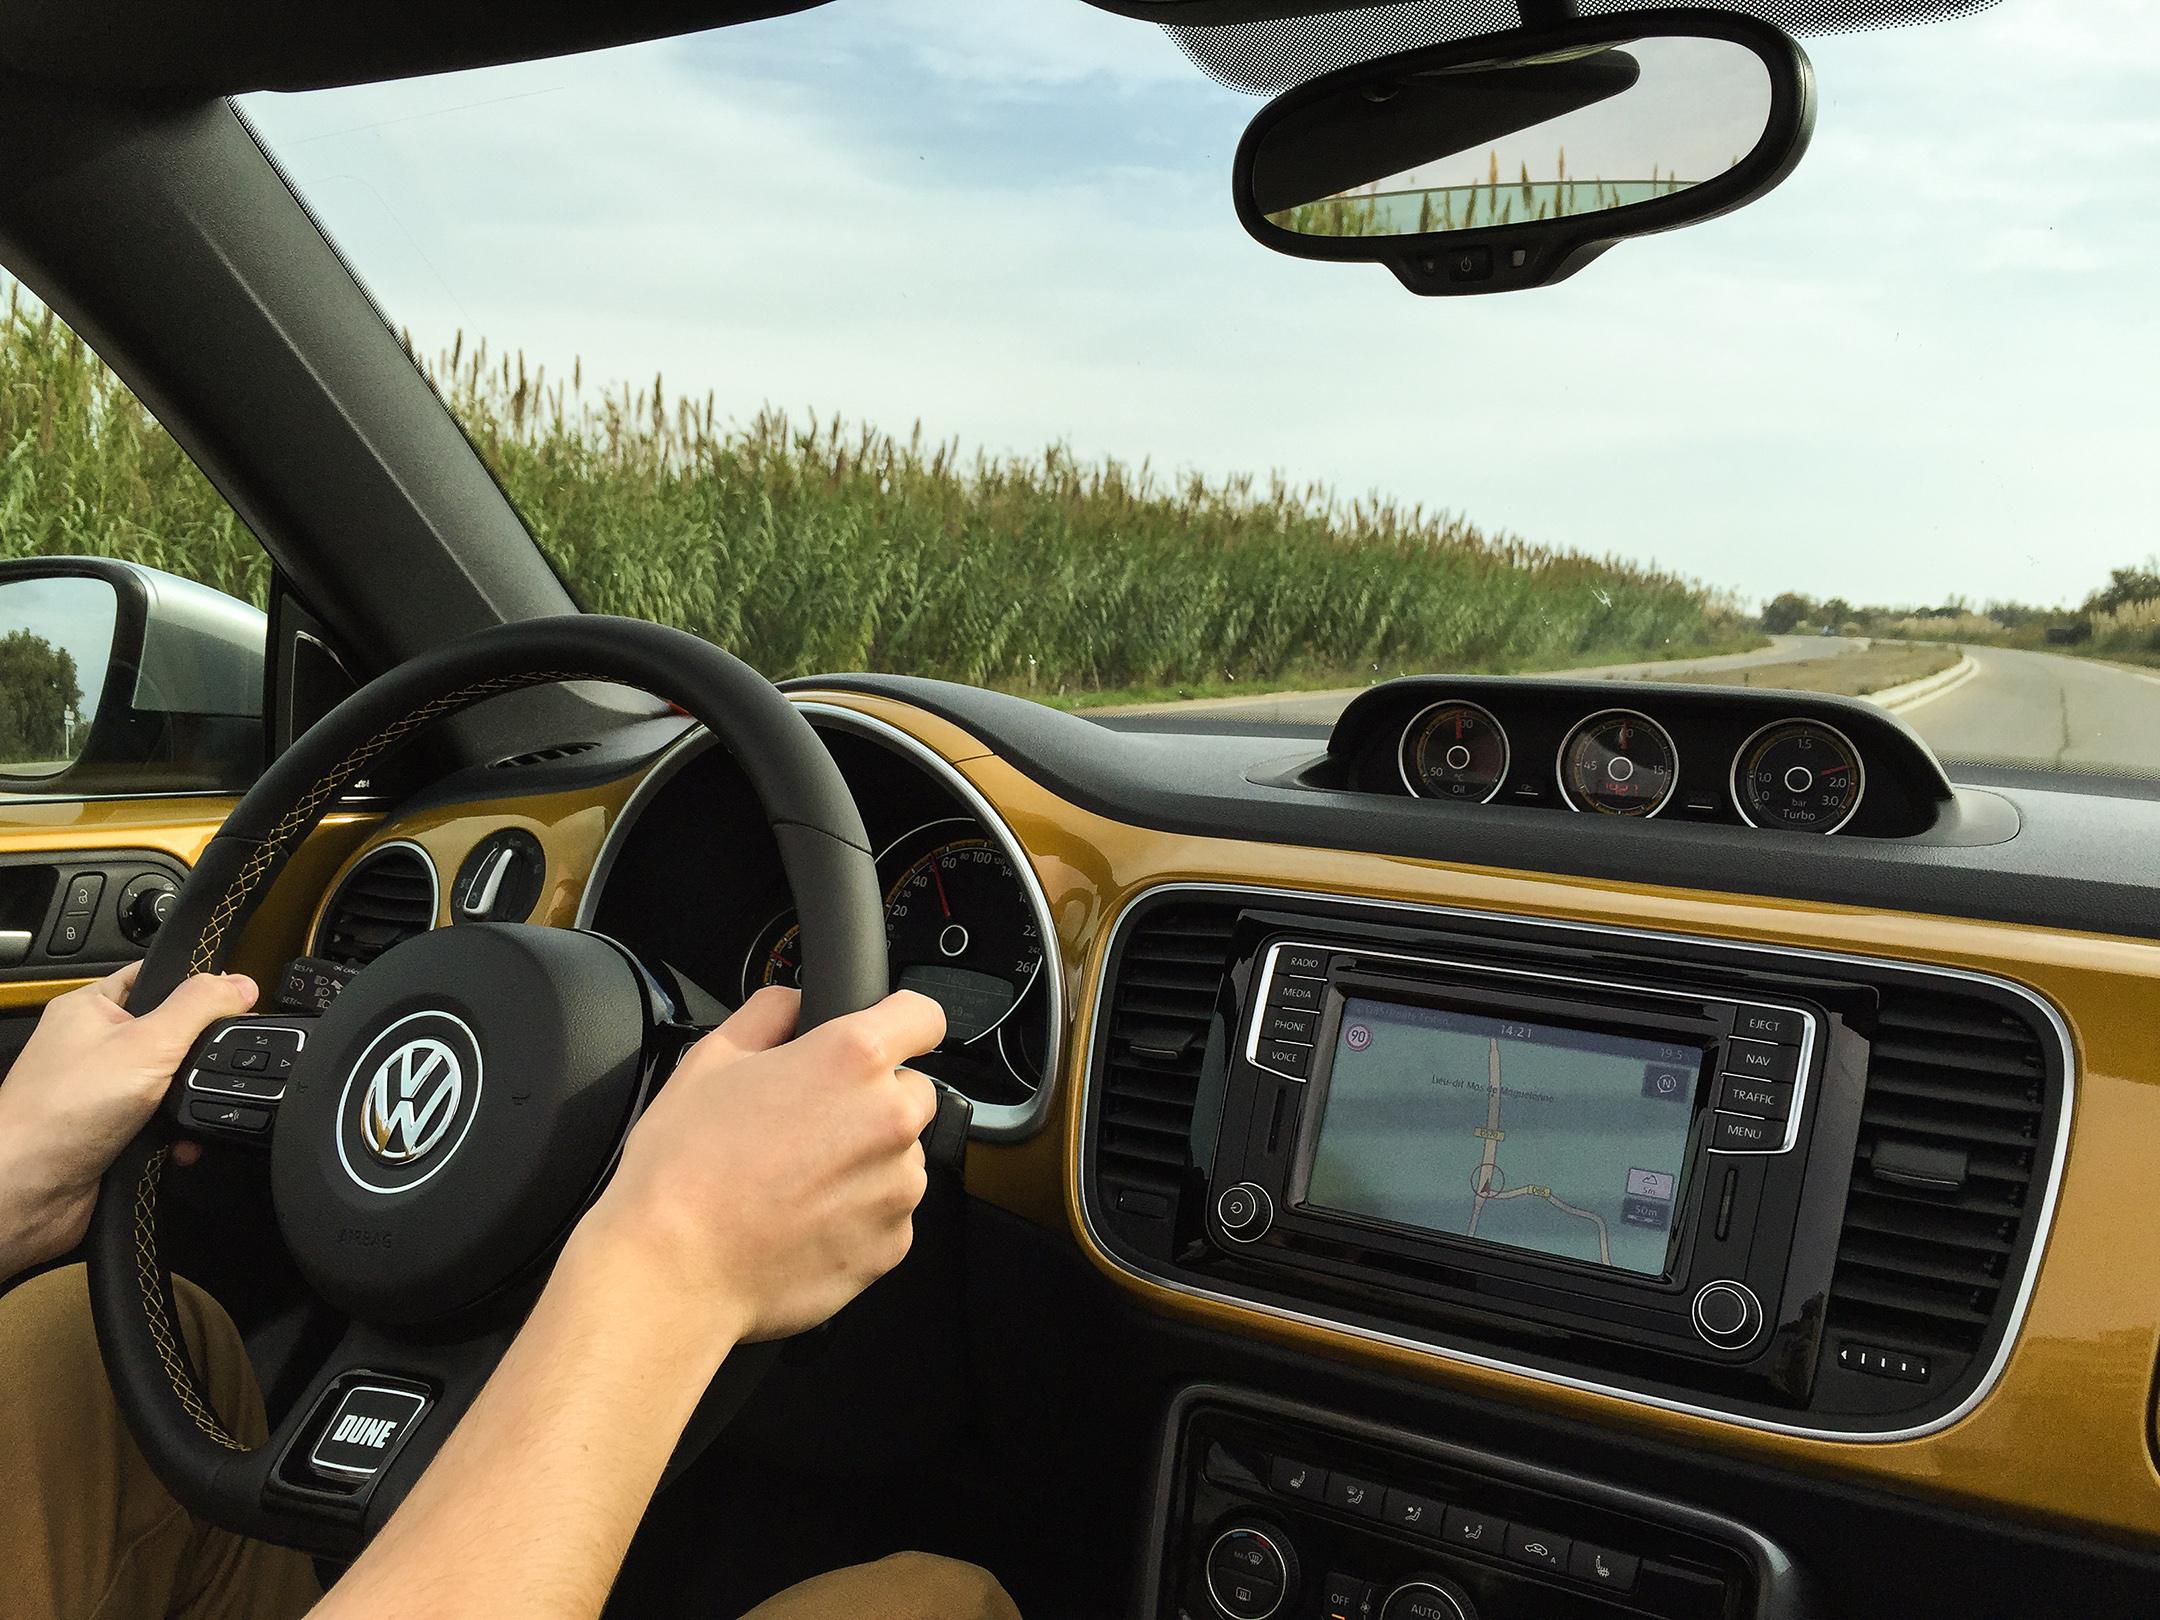 vwcox29-volkswagen-coccinelle-dune-cabriolet-interieur-arnaud-demasier-rsphotographie